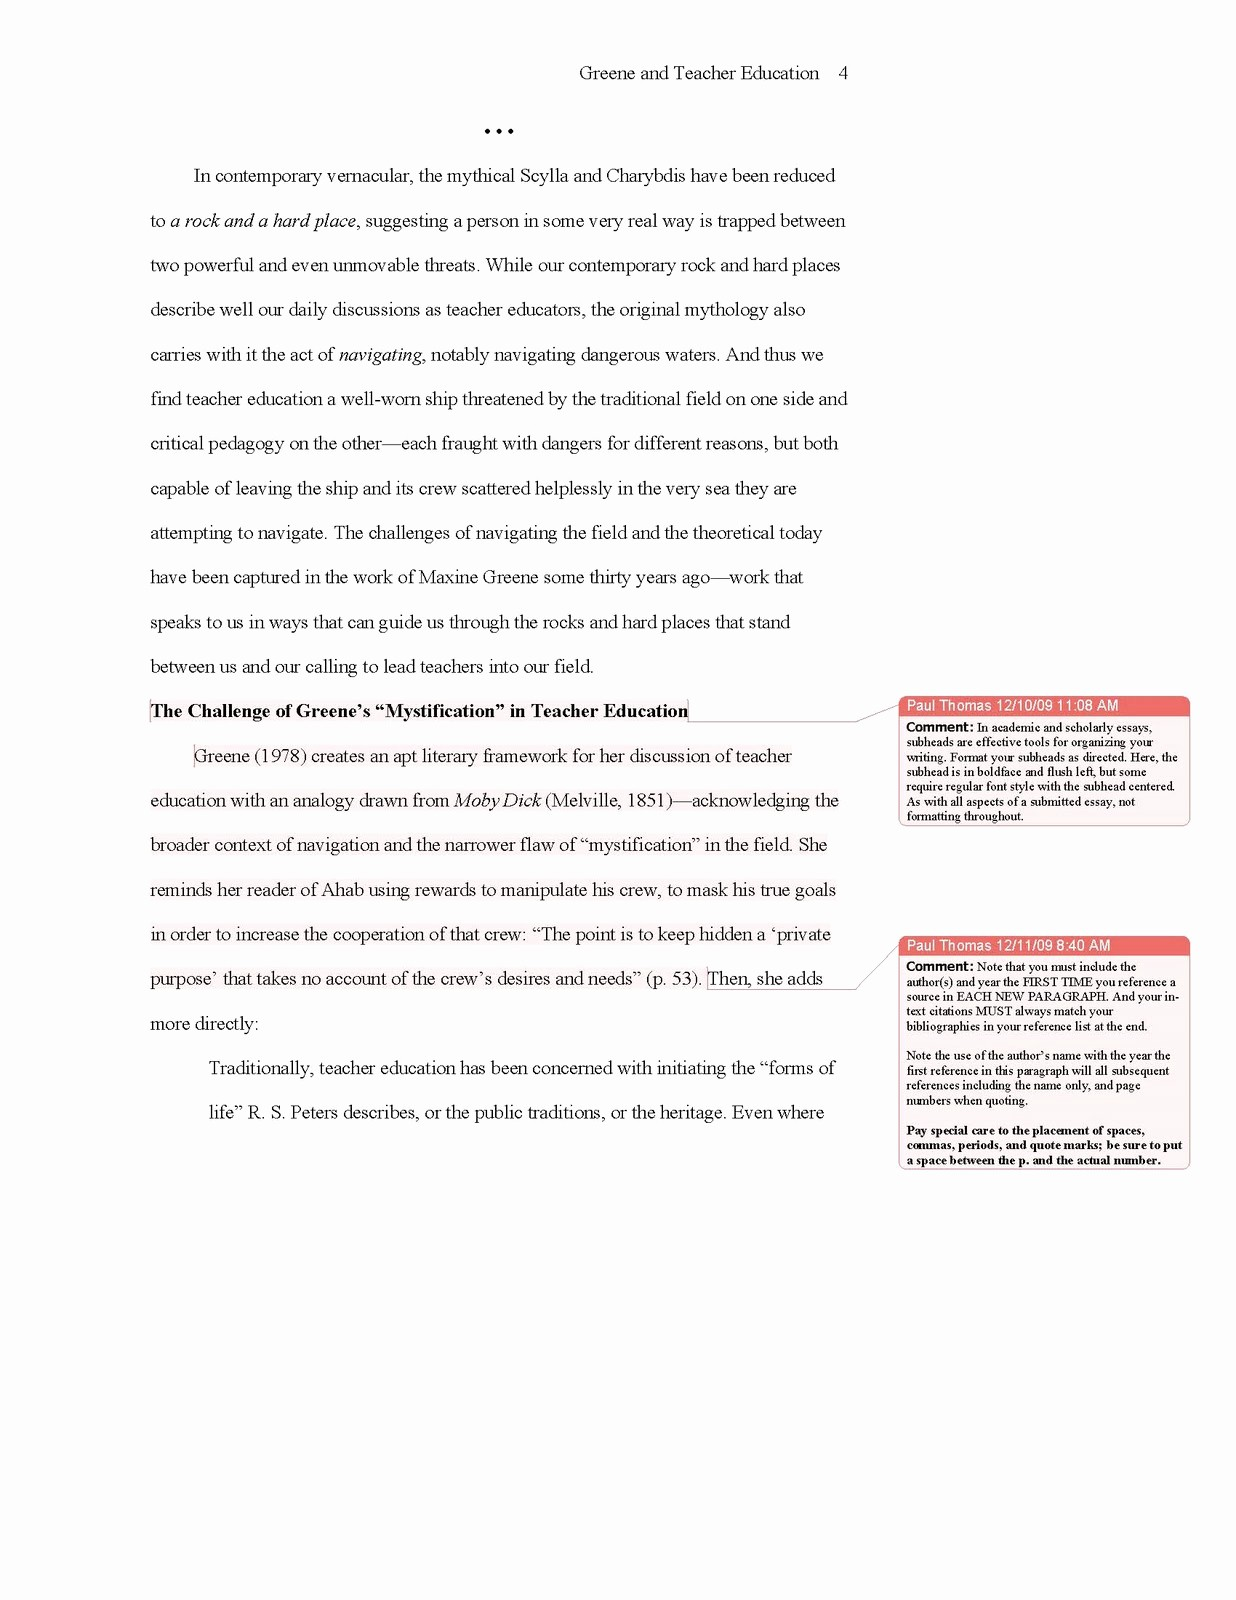 Apa format Example Paper Template Beautiful 49 Apa Essay format Sample Annotated Bibliography format